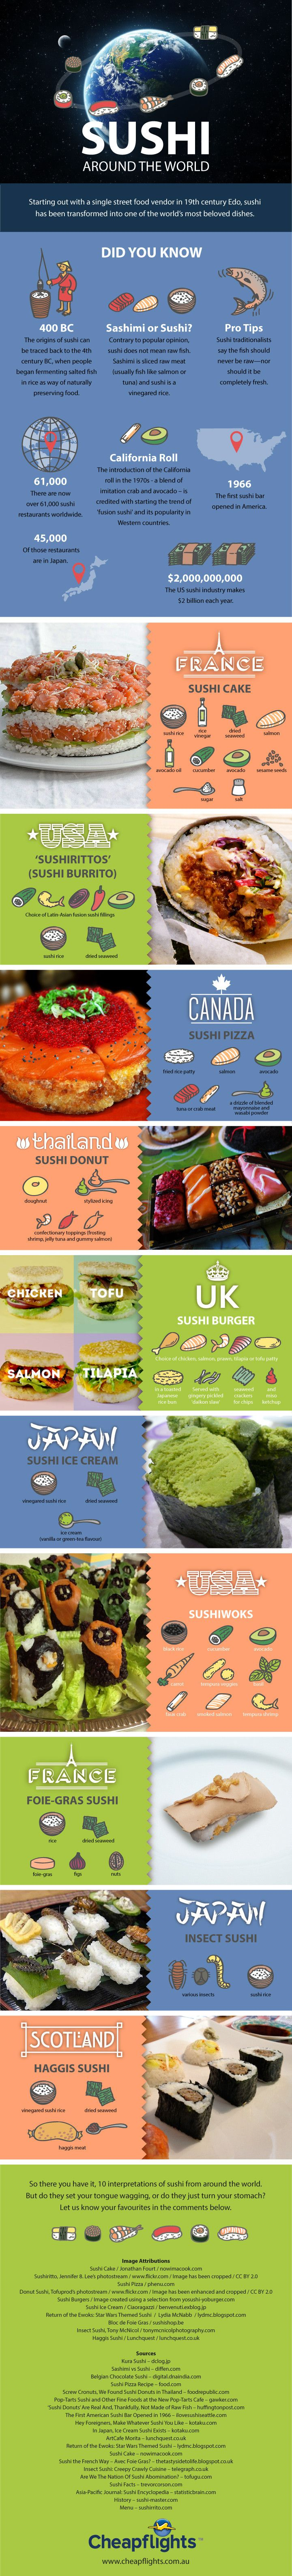 Sushi Around the World #infographic #Sushi #Food #travel